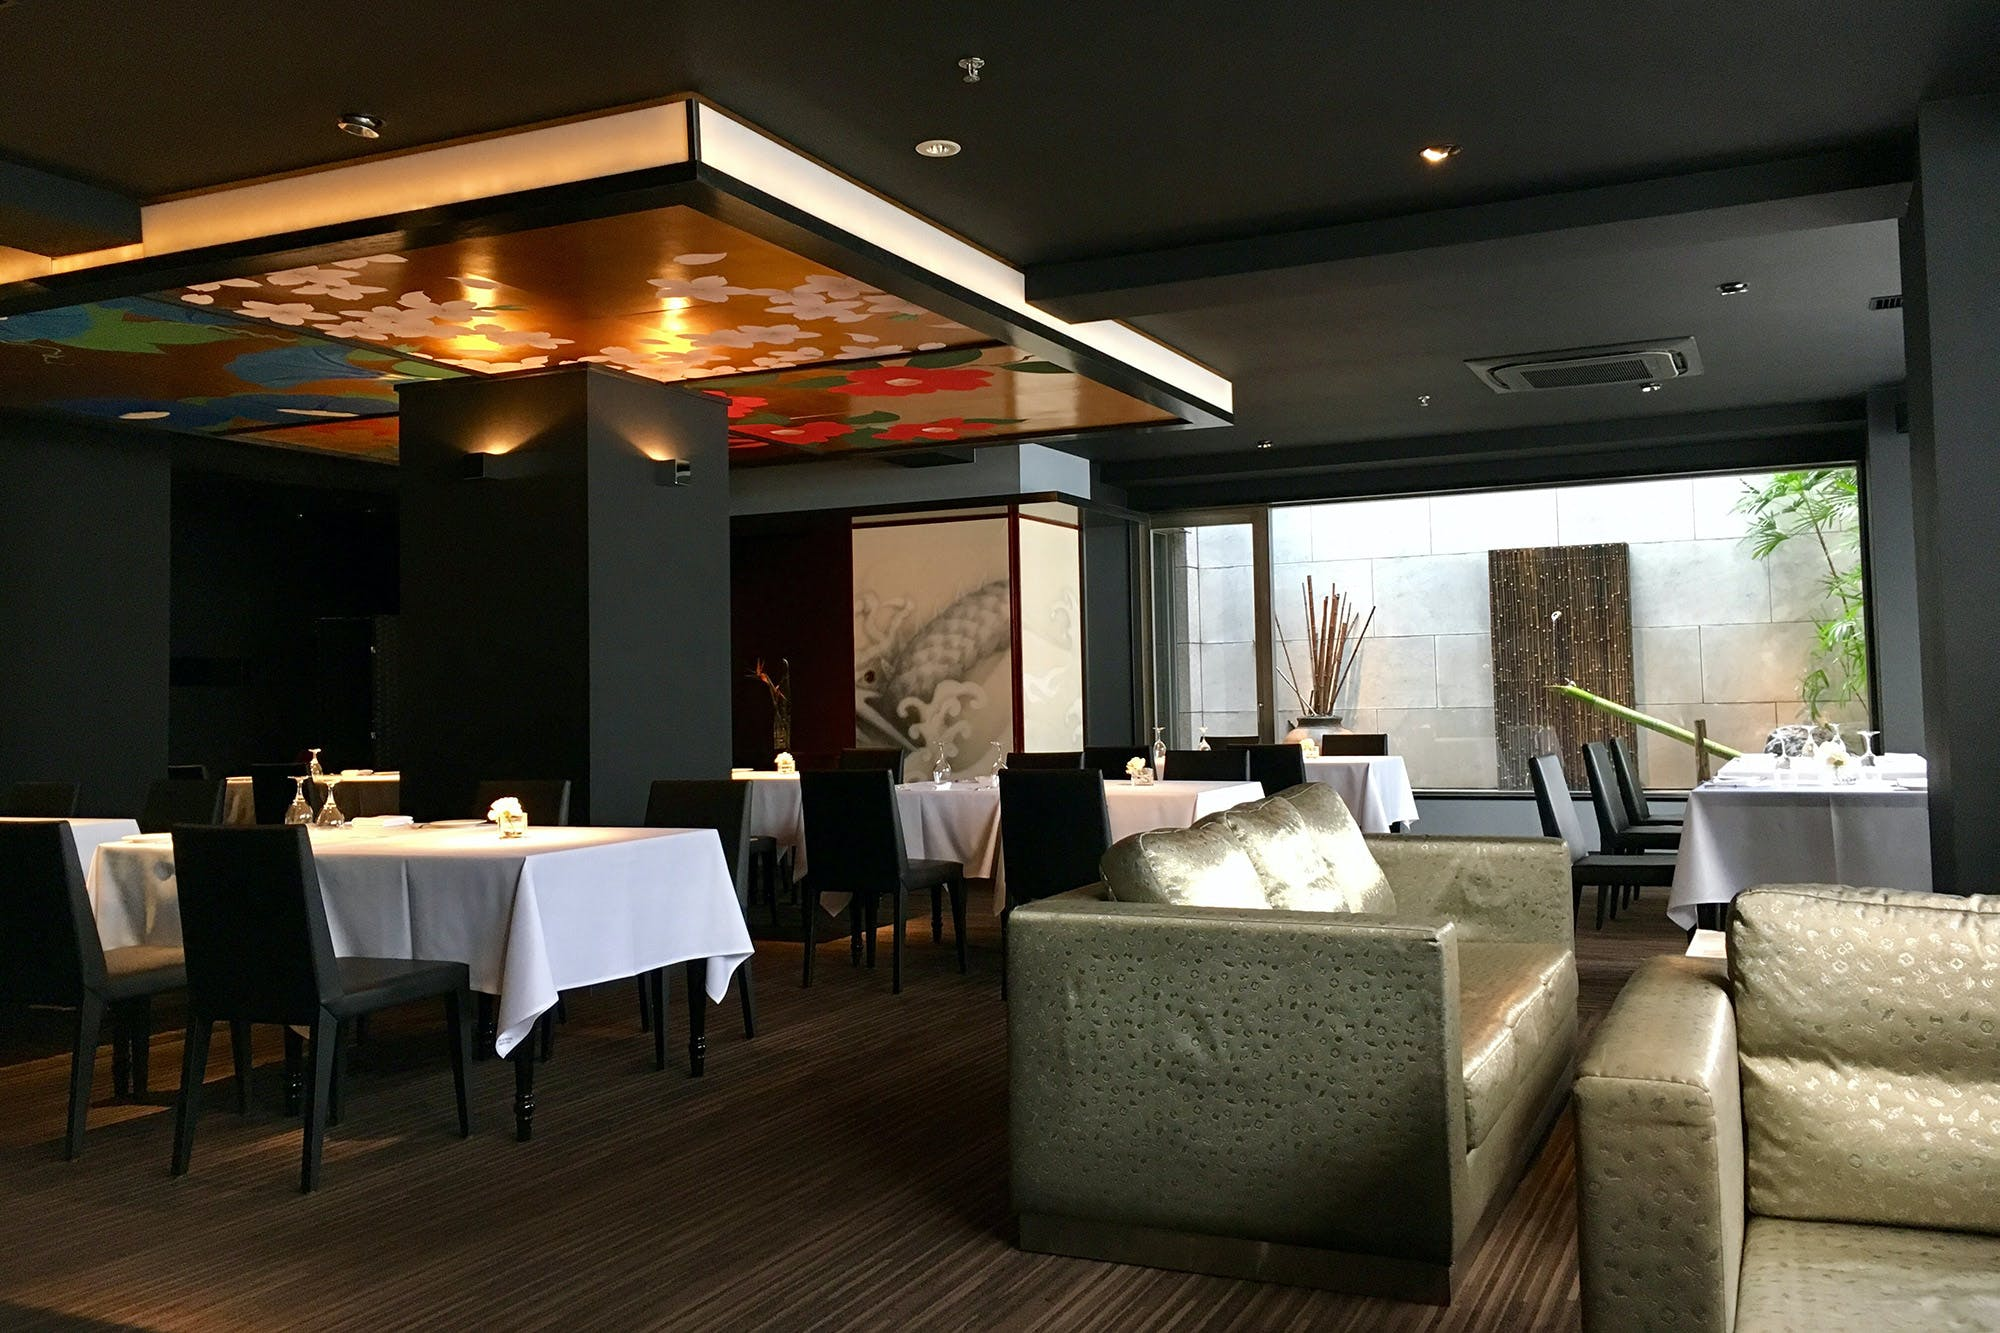 BRON RONNERY/デザイナーズホテル THE SCREEN